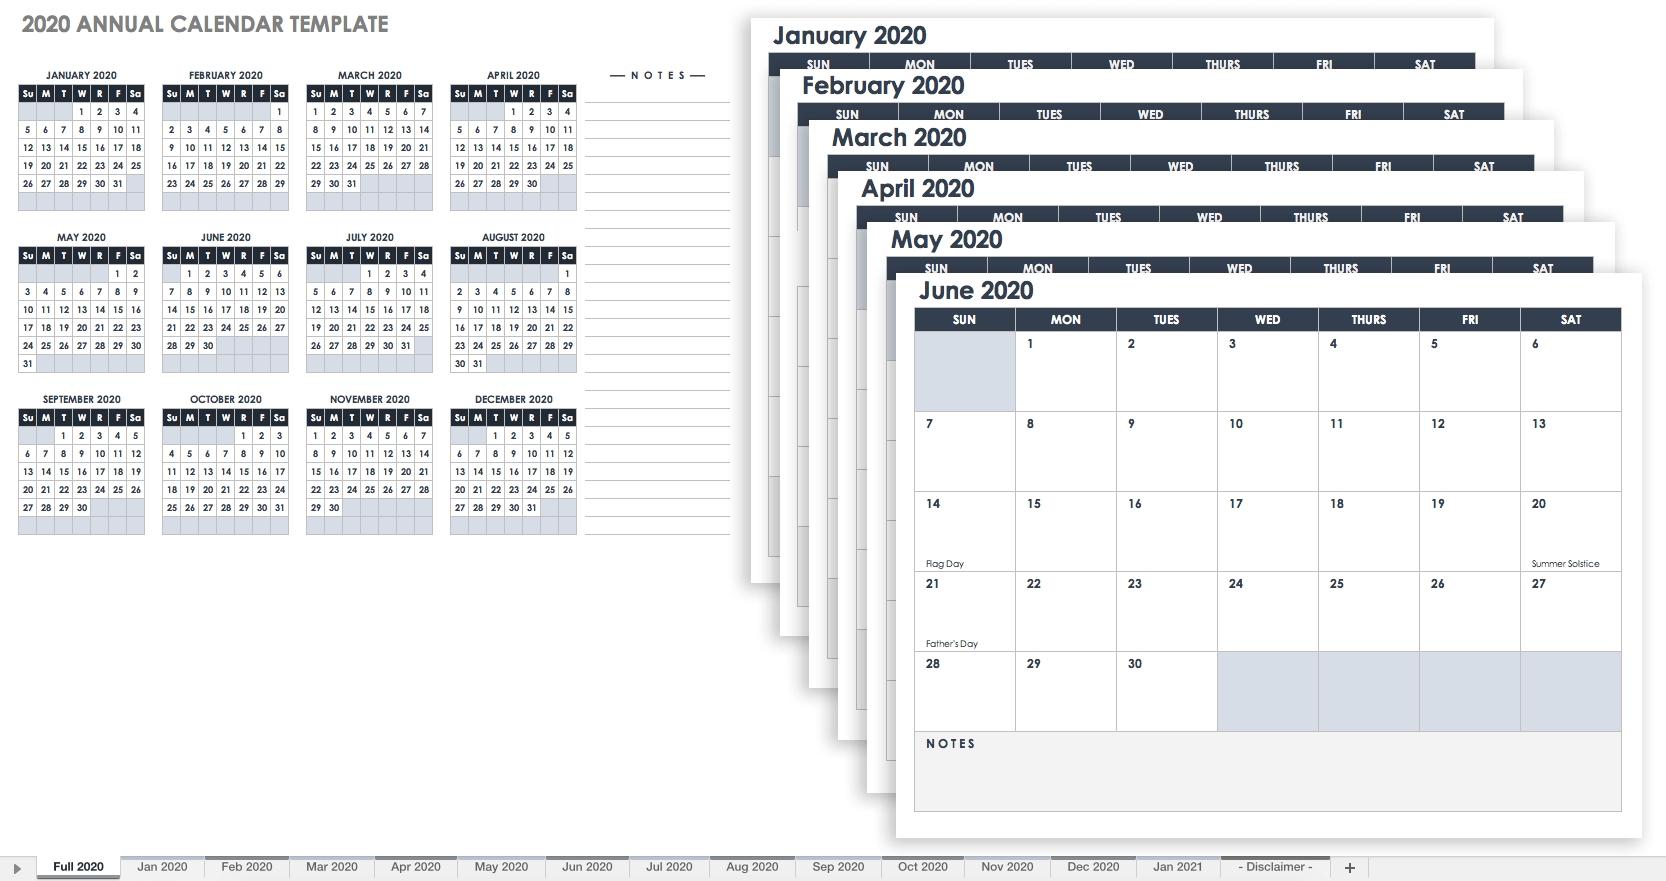 Free Blank Calendar Templates - Smartsheet-Calendar Templates 3 Months Per Page 2020